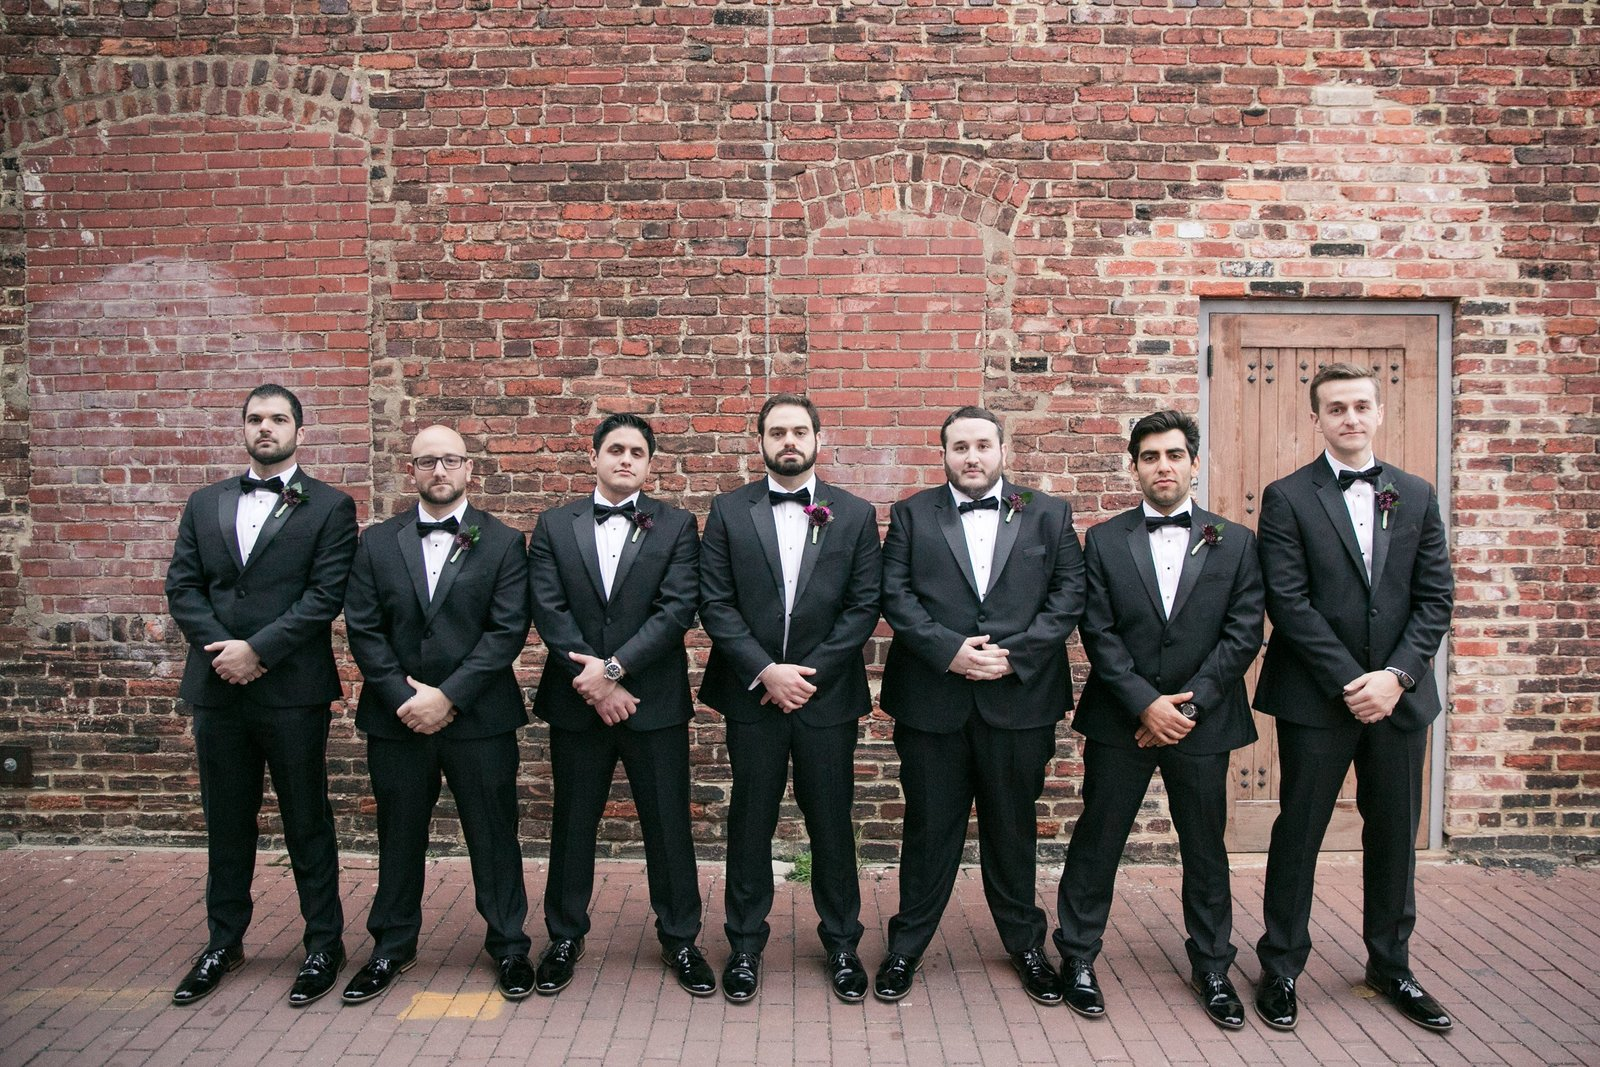 Black-tie-wedding-photos-longview-gallery-dc (172)